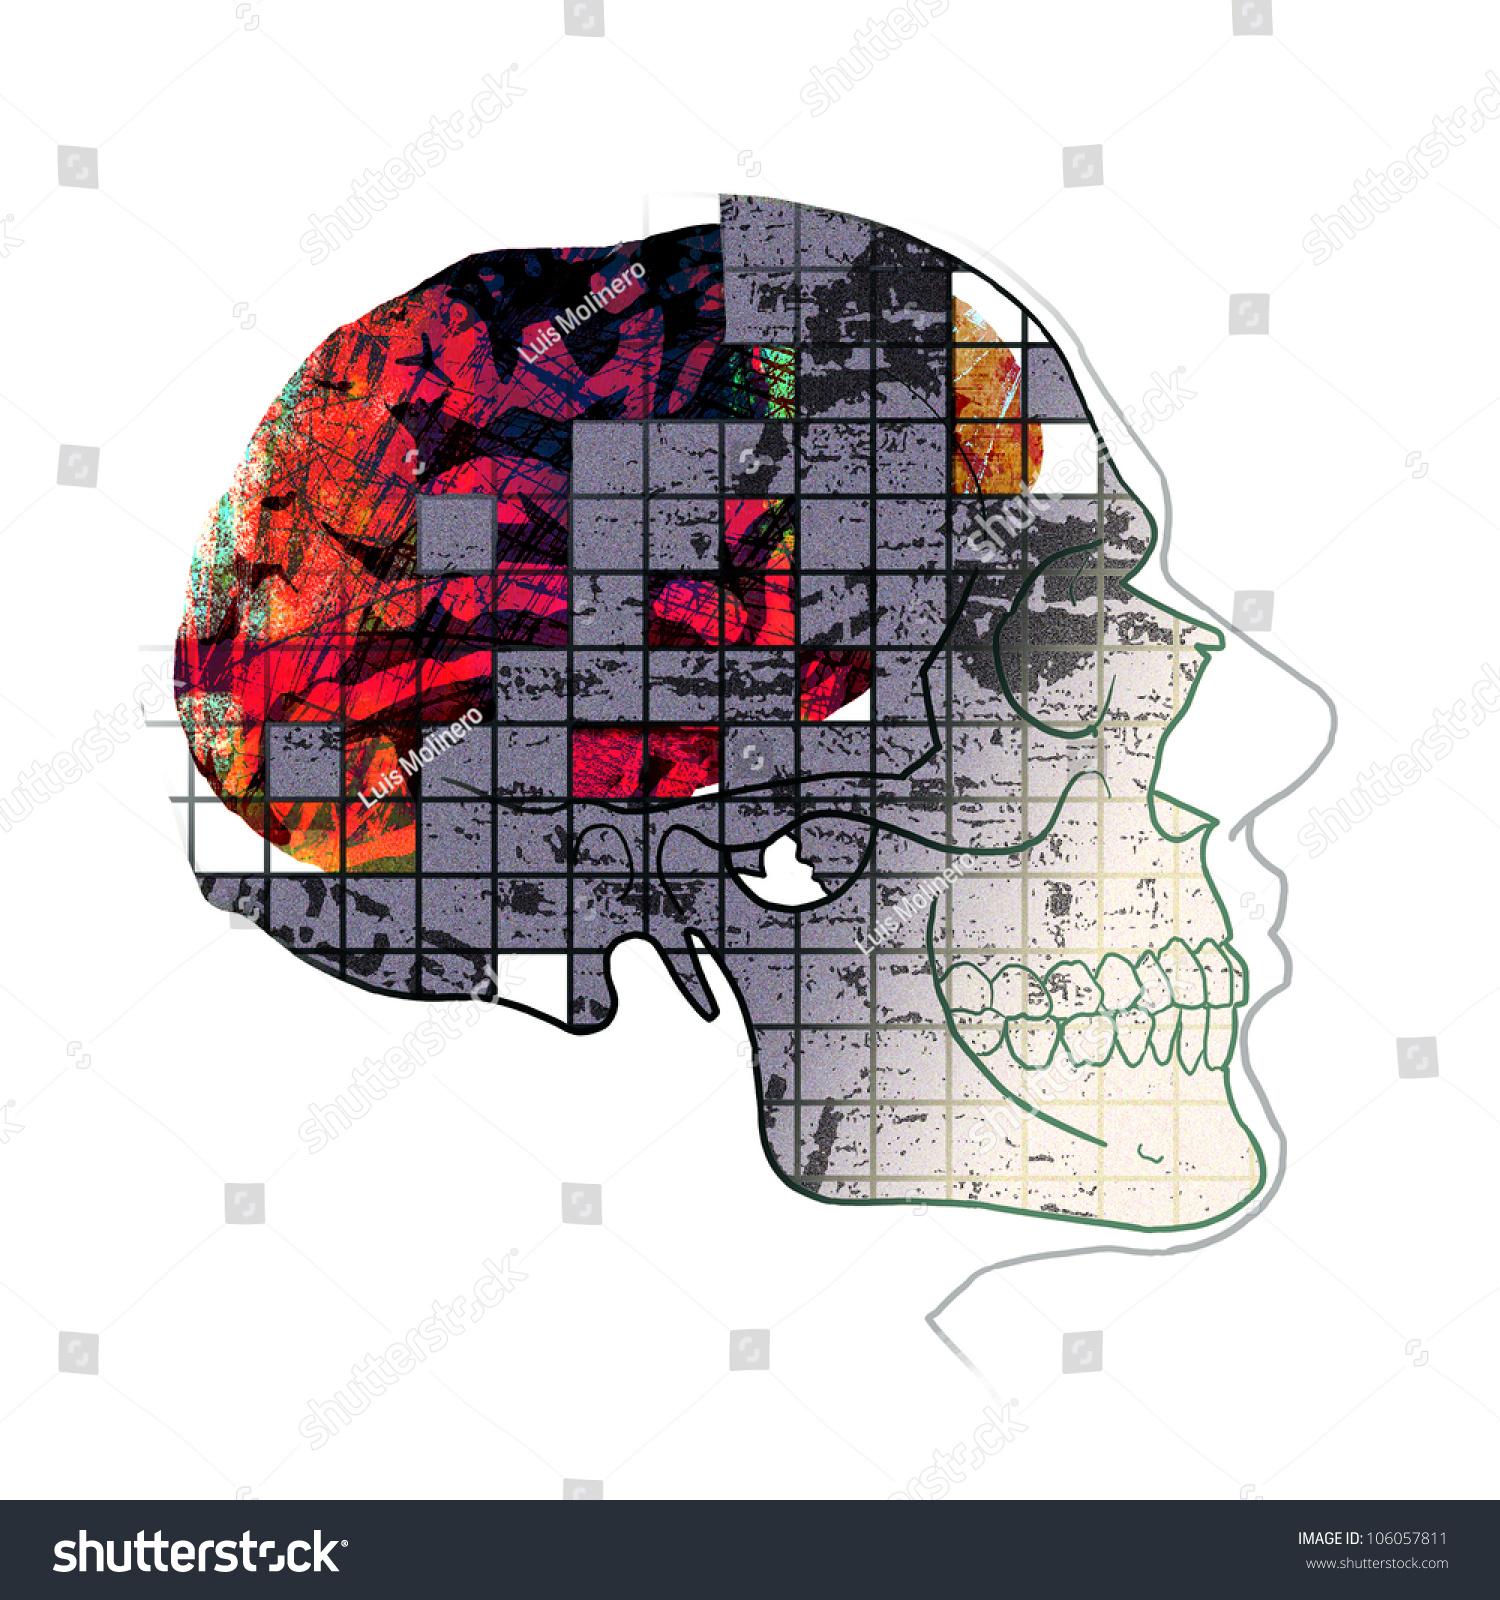 Anatomy head brain skull illustration stock illustration 106057811 head brain and skull illustration ccuart Image collections